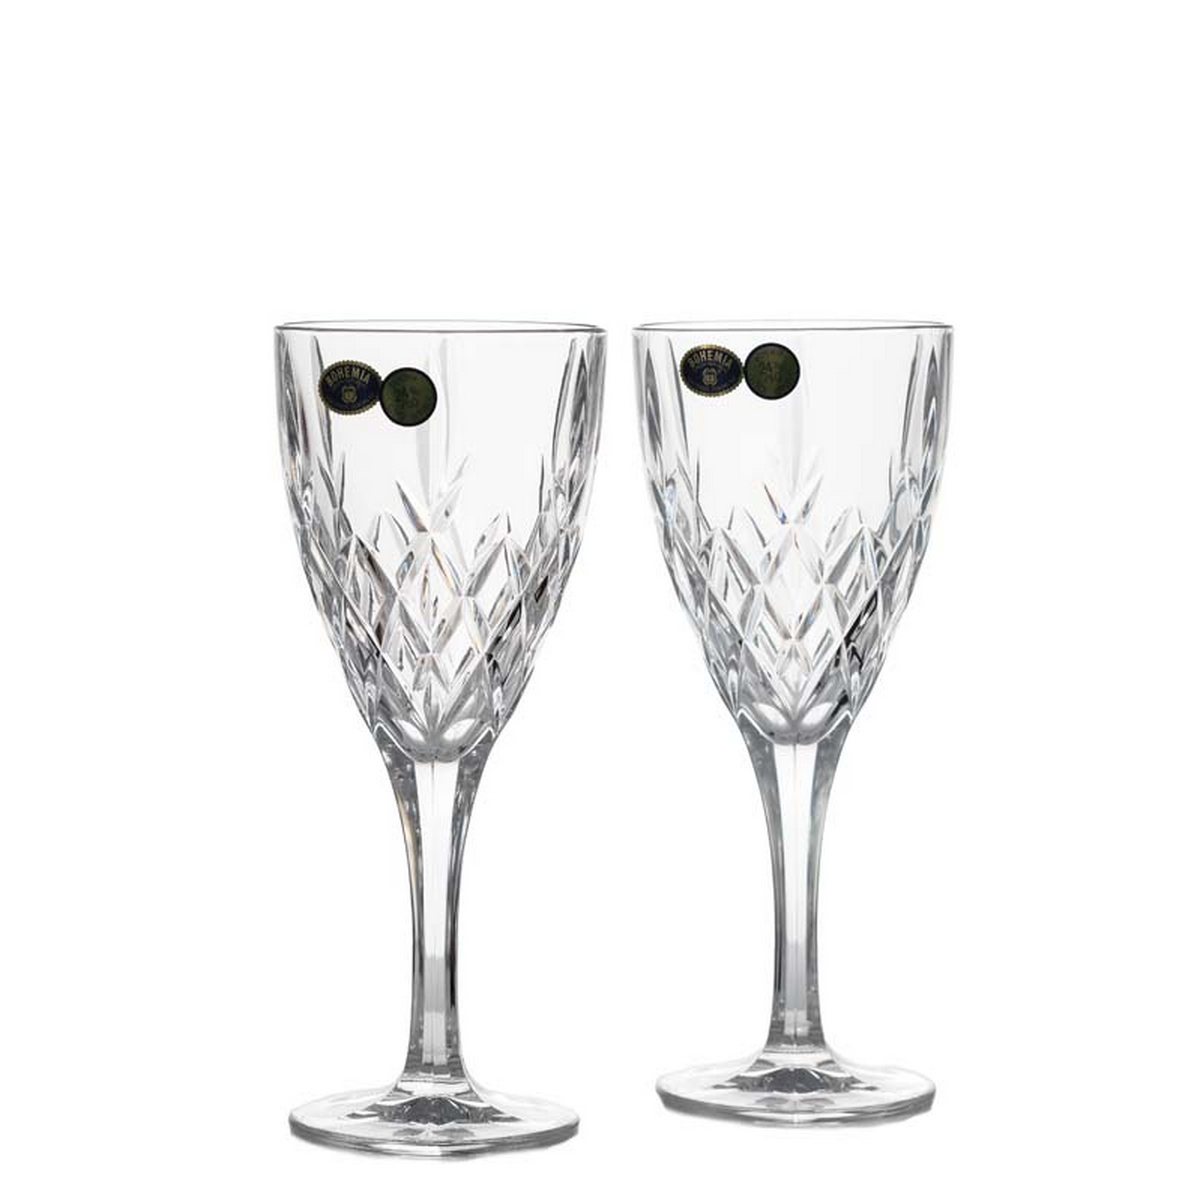 Brixton Set 6 Pahare Cristal Bohemia Vin 250 Ml 2021 aranjareamesei.ro